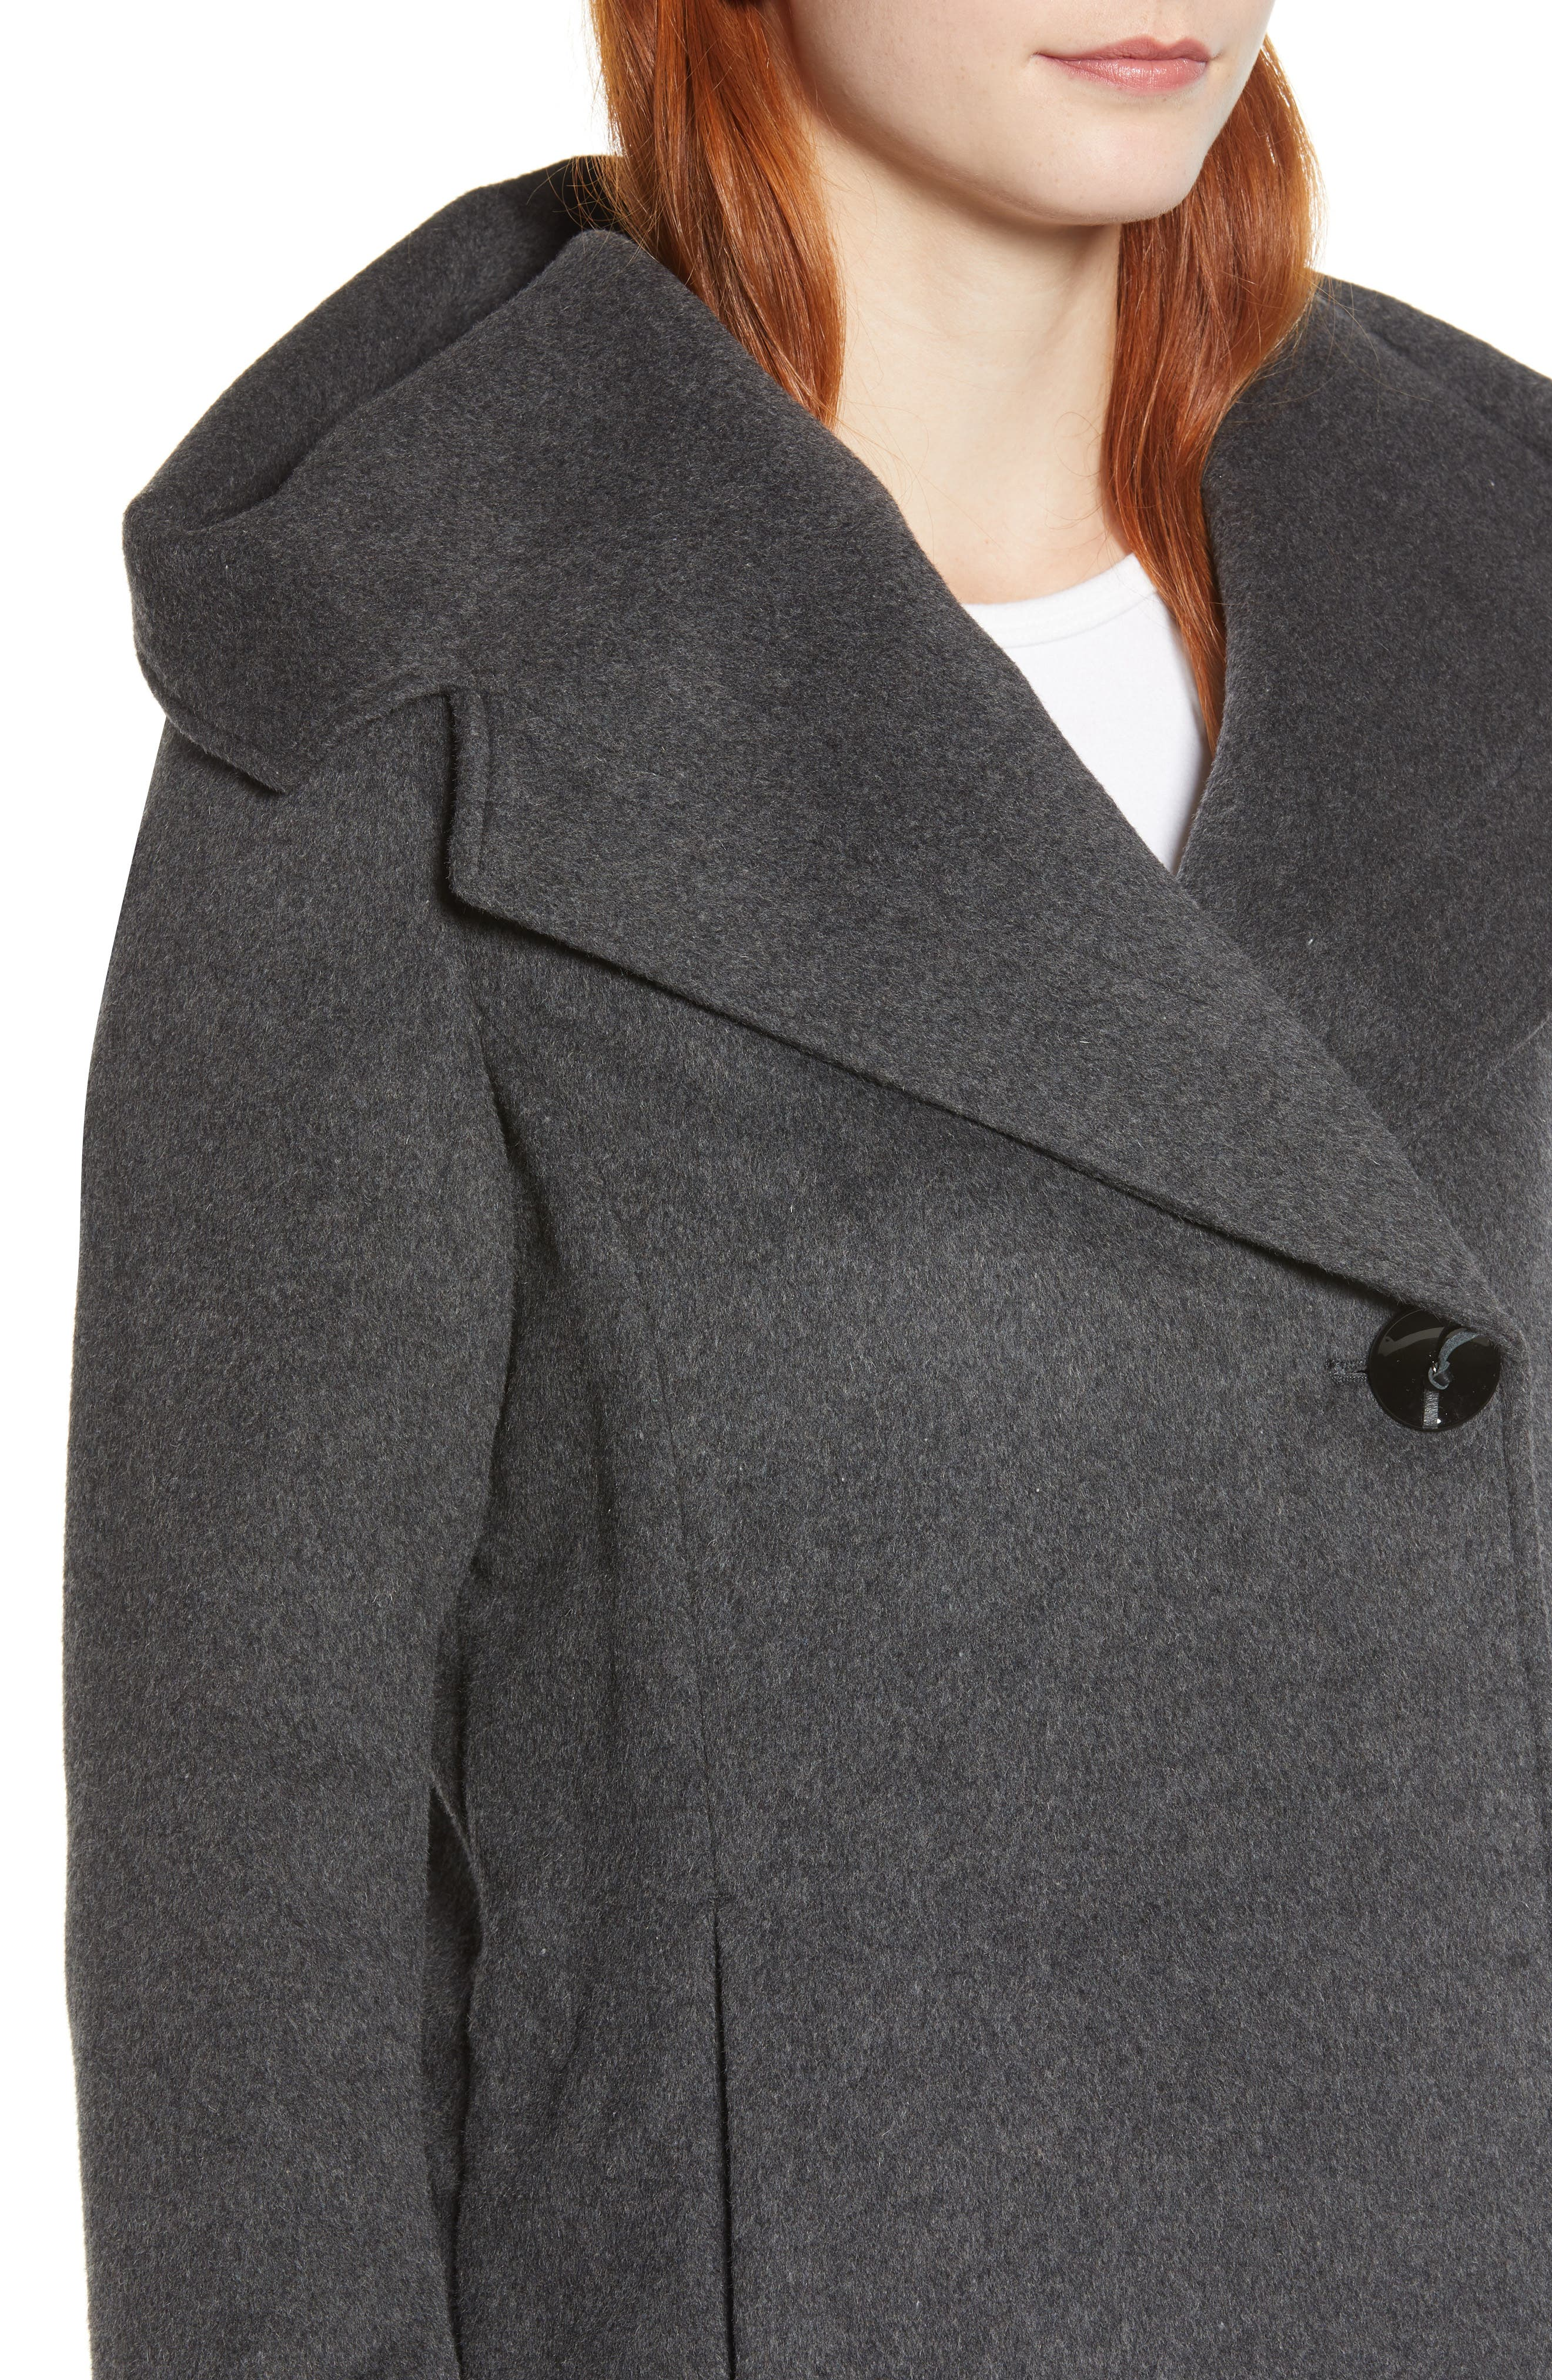 Shawl Collar Hooded Coat,                             Alternate thumbnail 4, color,                             CHARCOAL